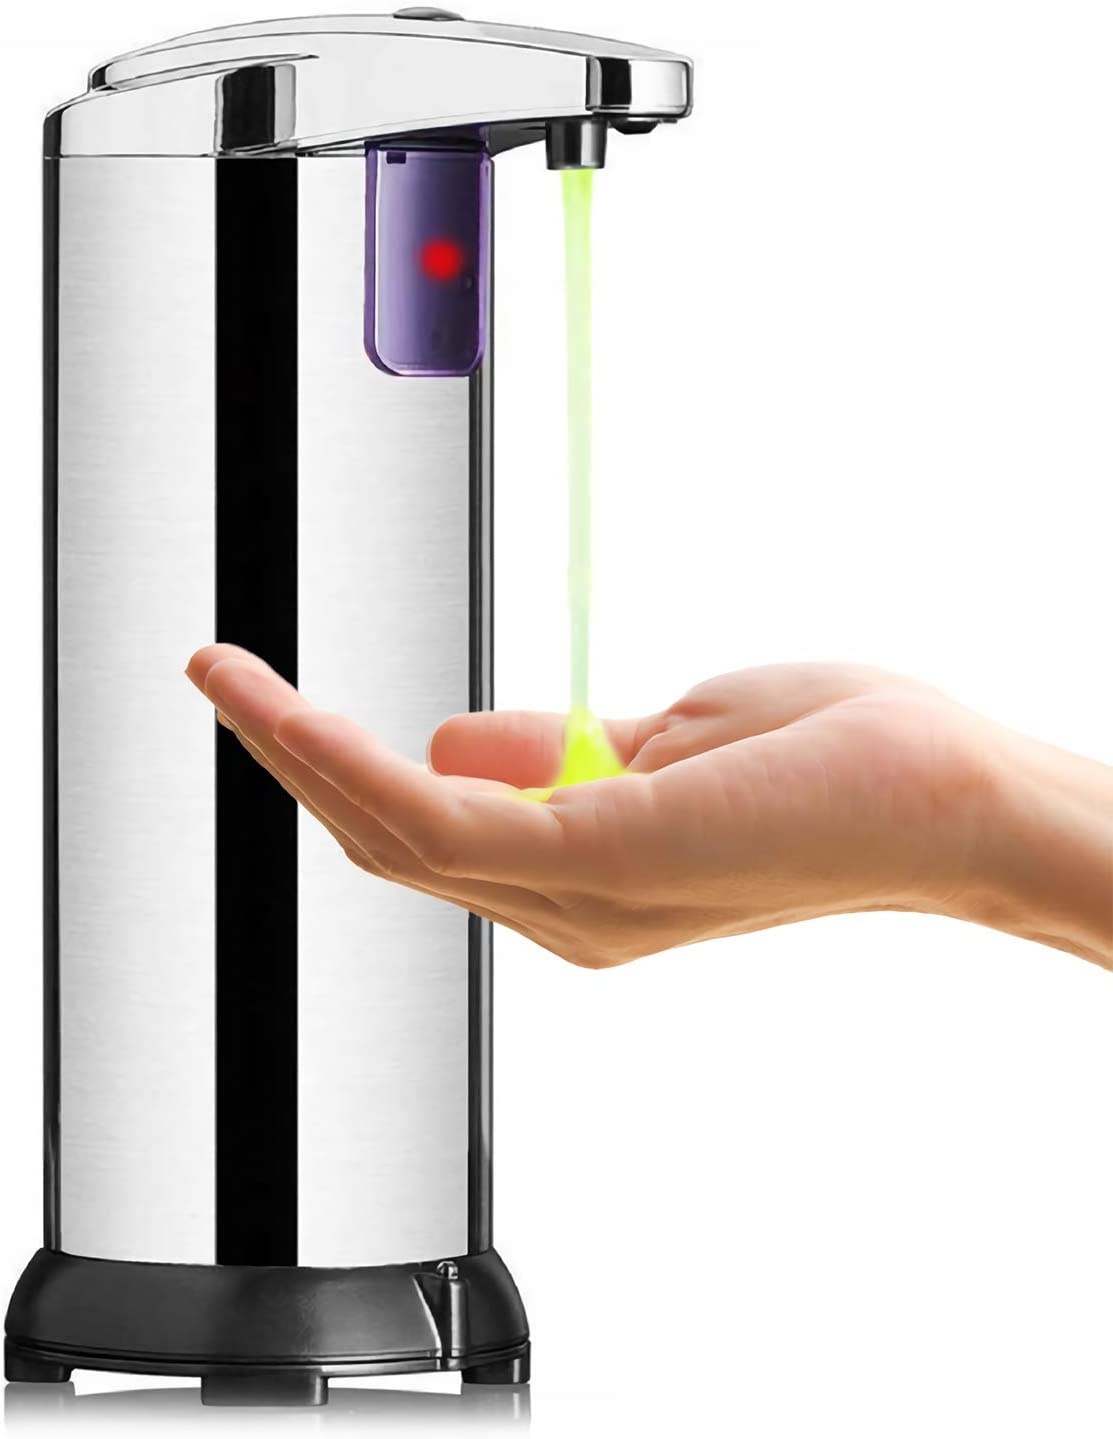 KIPIDA Dispensador Automático de Jabón,Contacto Dispensador de por Infrarrojos de Jabón con Acero Inoxidable,Manos Libres Dispensadores de Loción 250ML Ajustable Cocina Baño Oficina